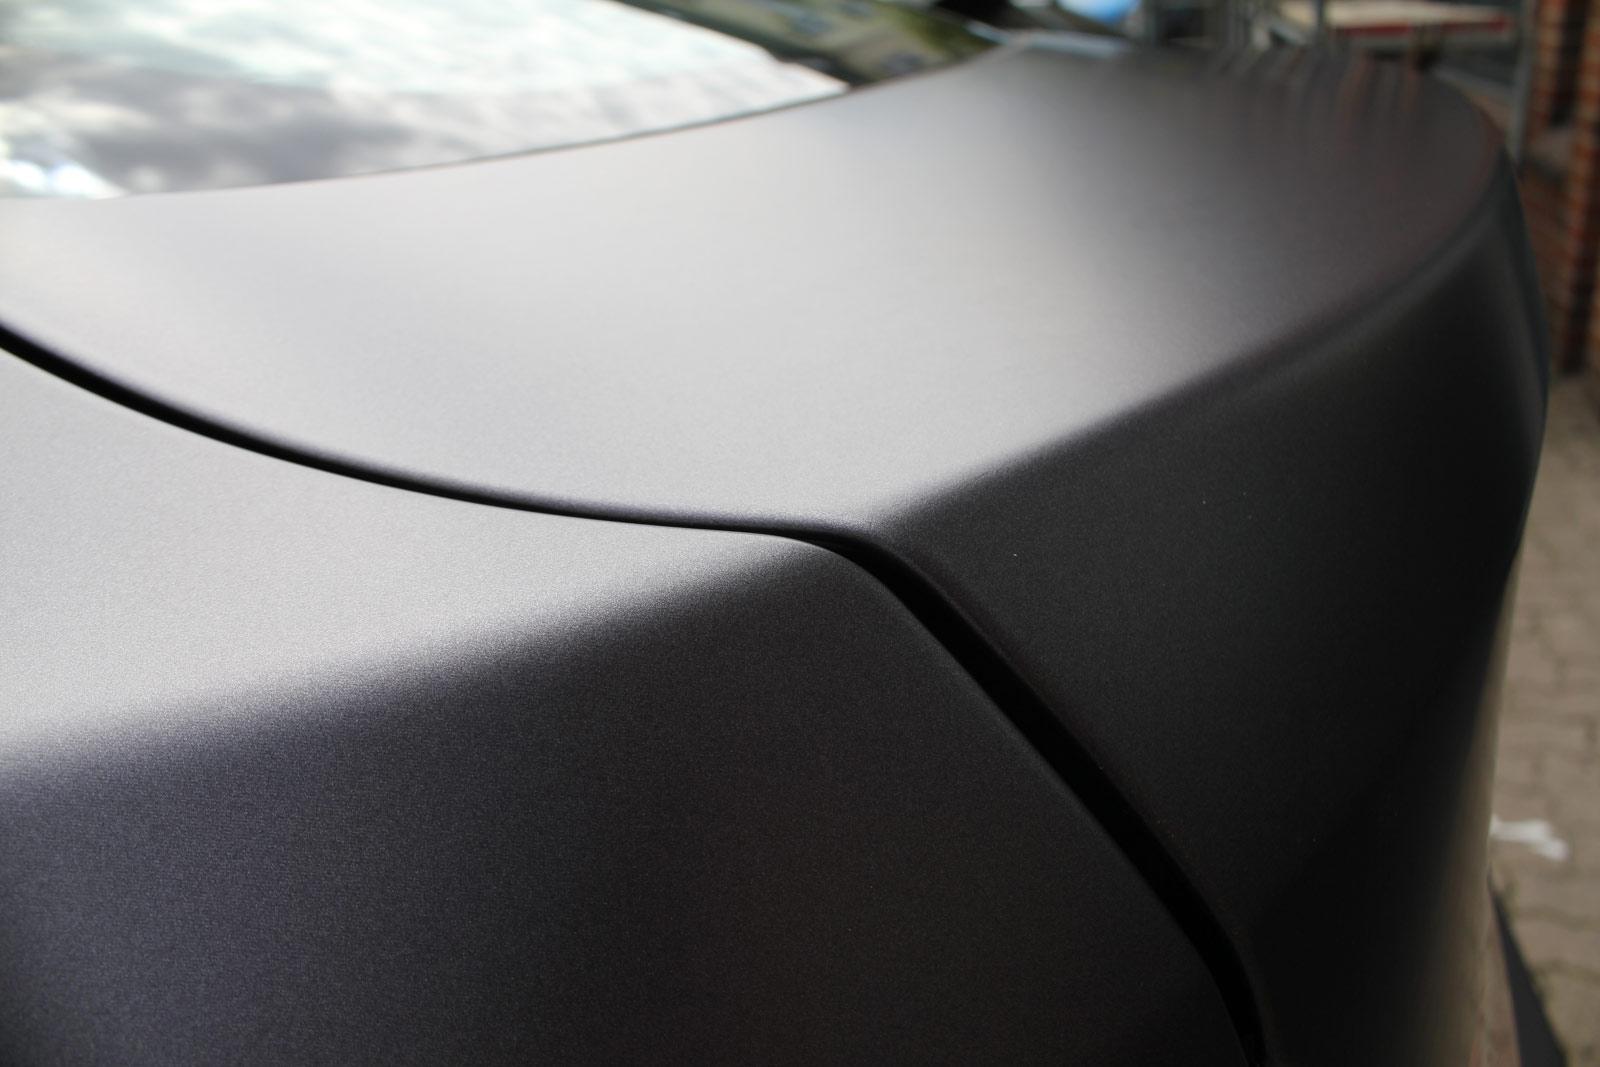 BMW_X6_Folierung_Anthrazit_Metallic_Matt_14